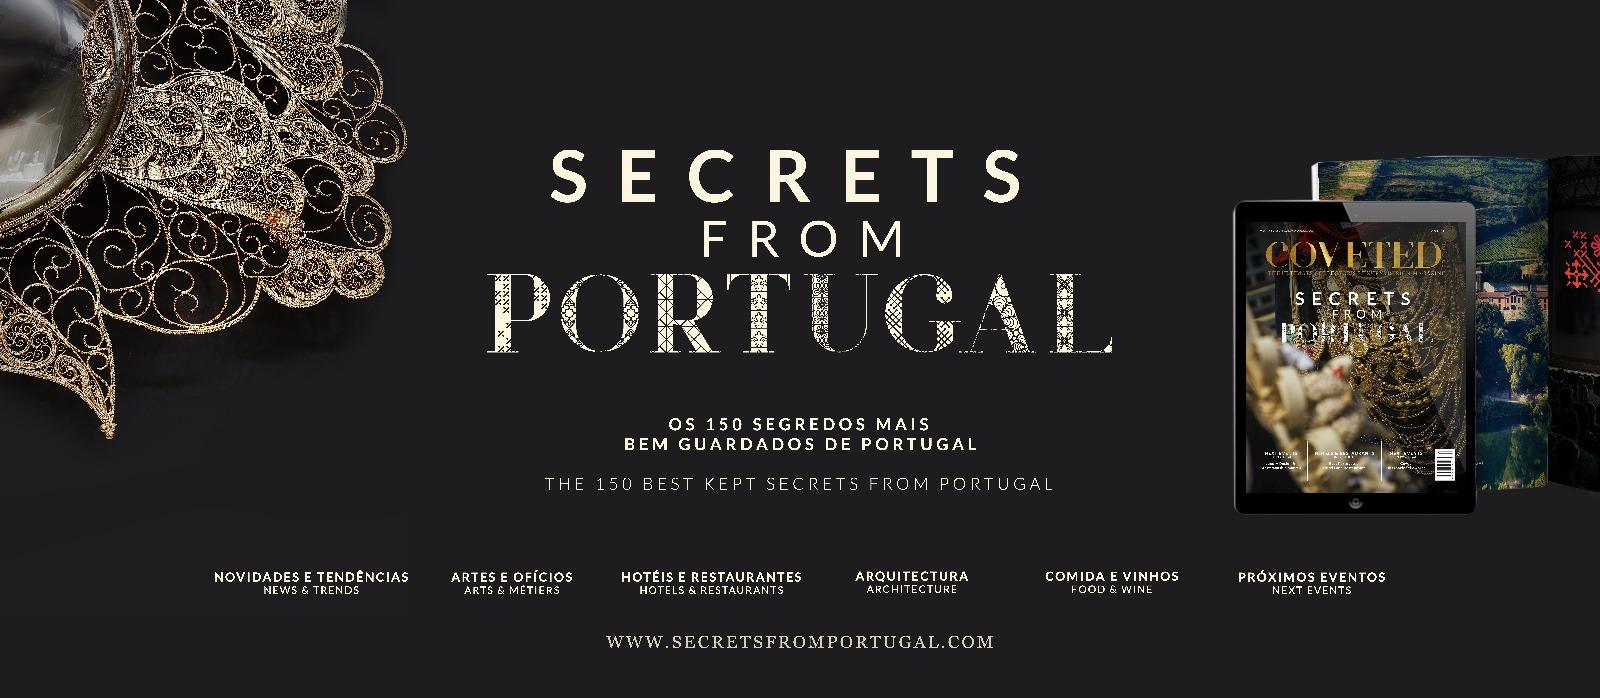 secrets from portugal Secrets From Portugal: For Adventure Lovers Banner Secrets